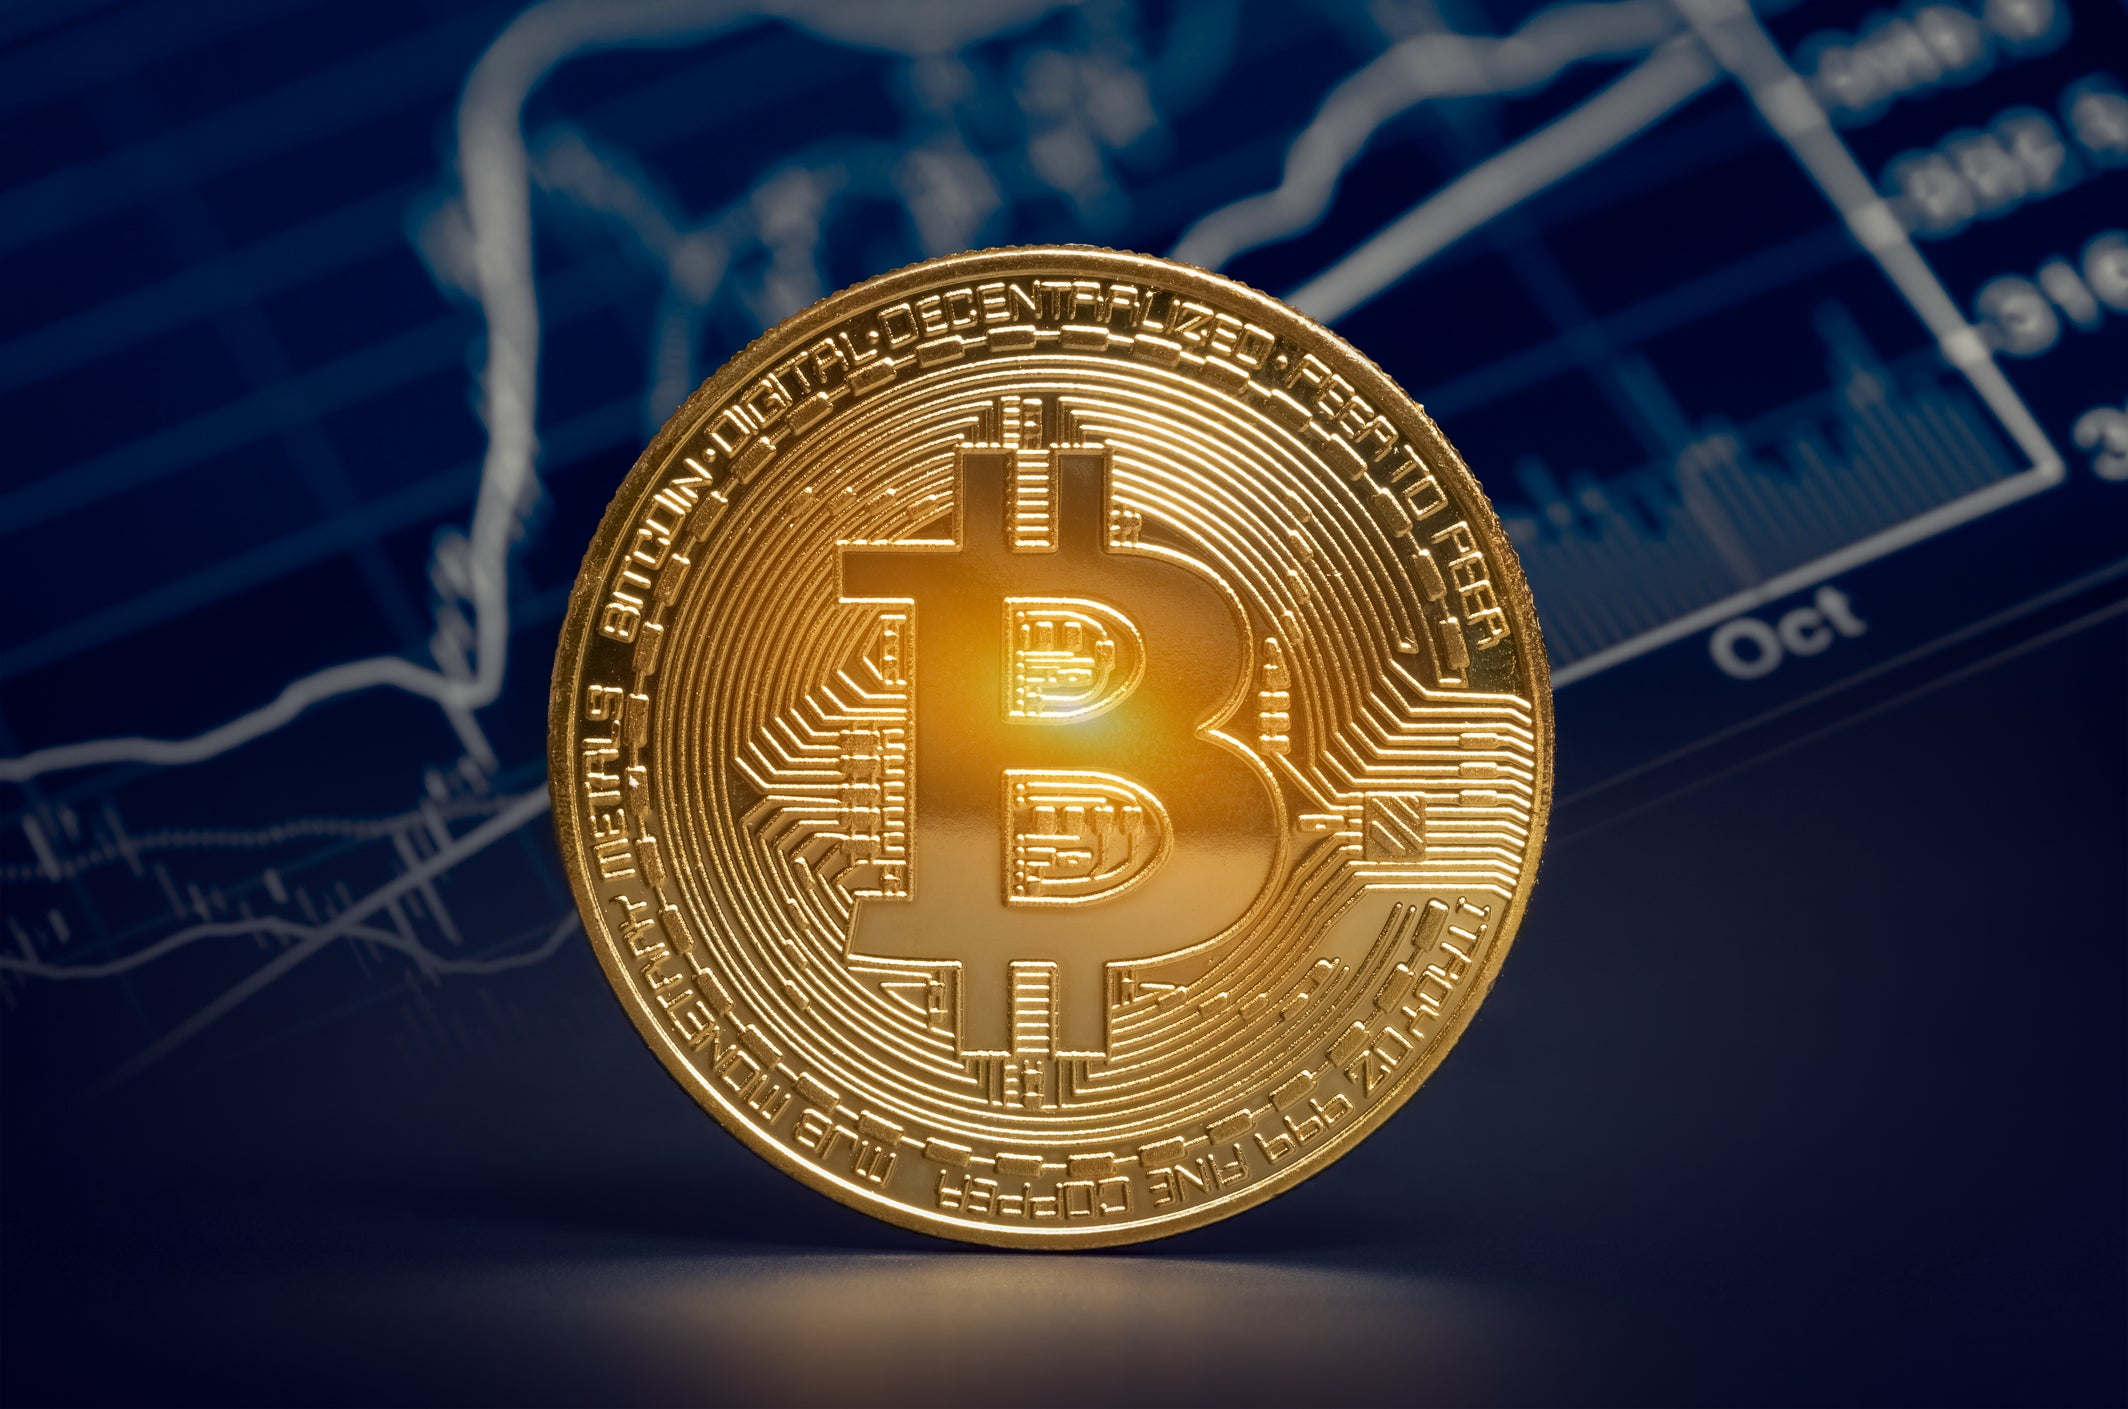 šį rytą holly bitcoin